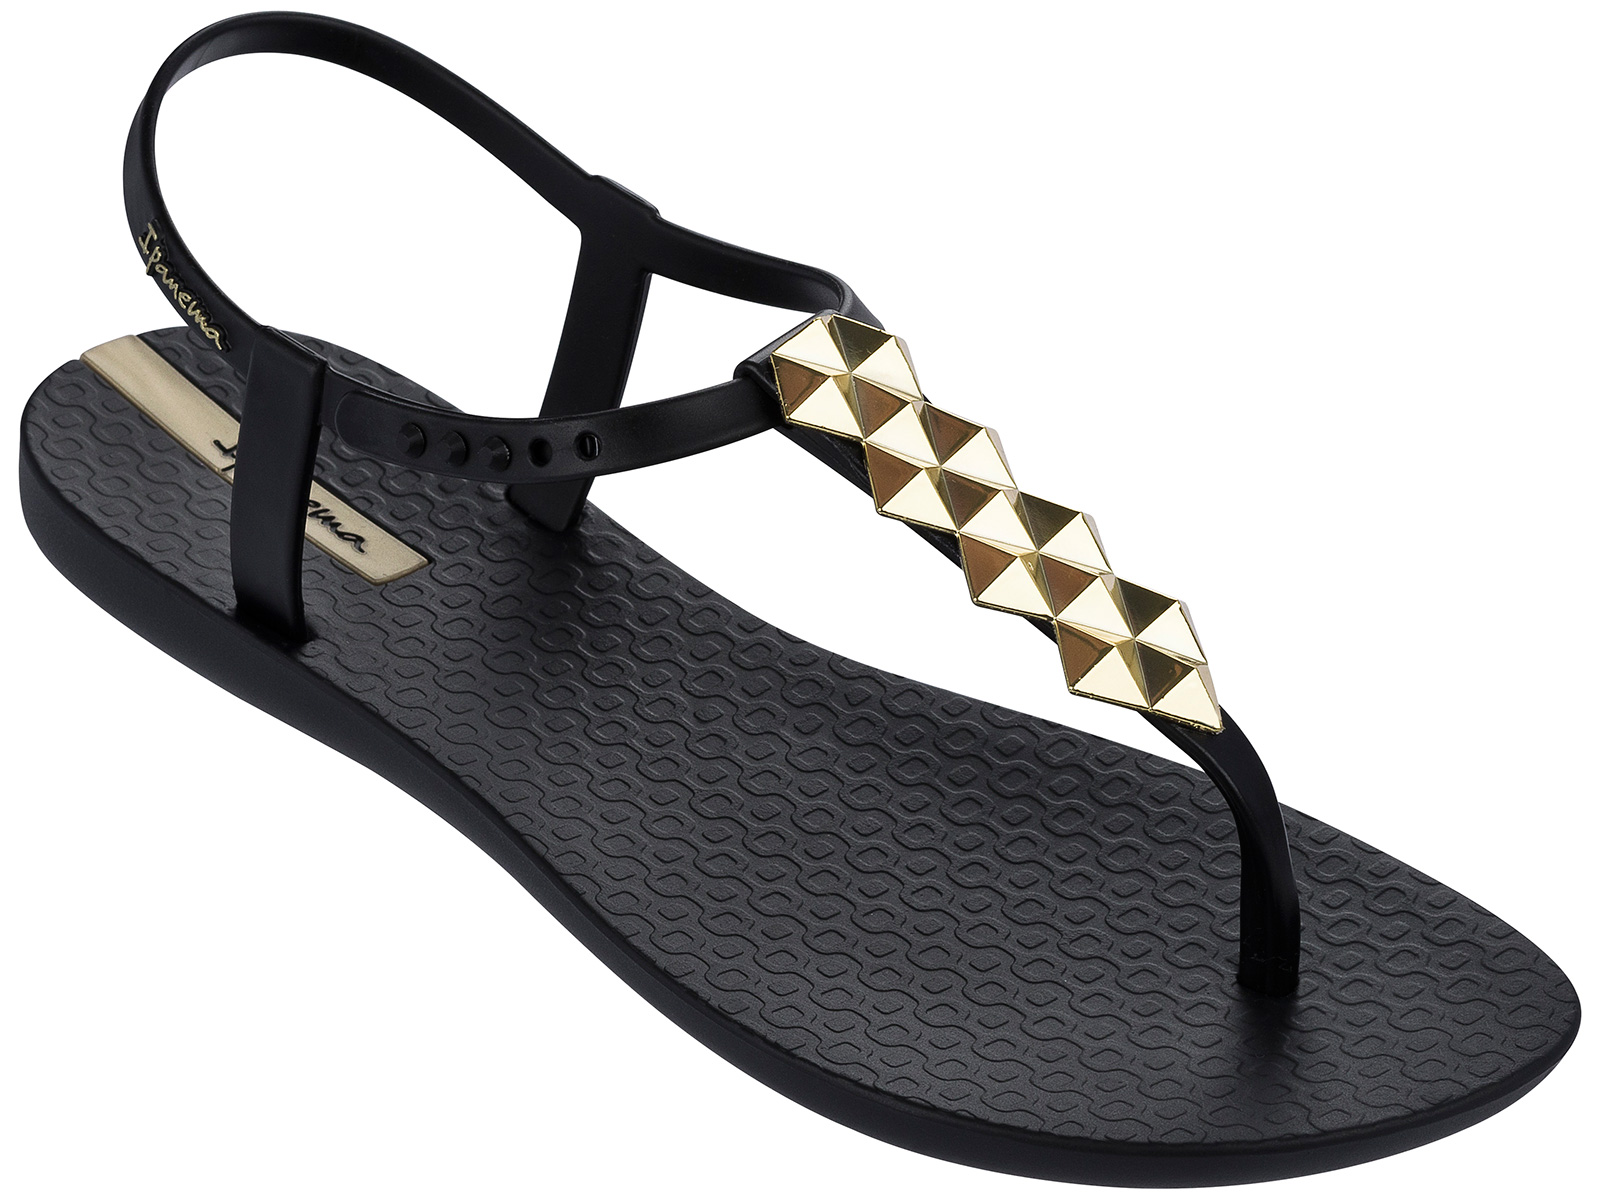 Sandals in black - Black Flip Flops Ipanema Charm Ii Sandal Black Black Gold